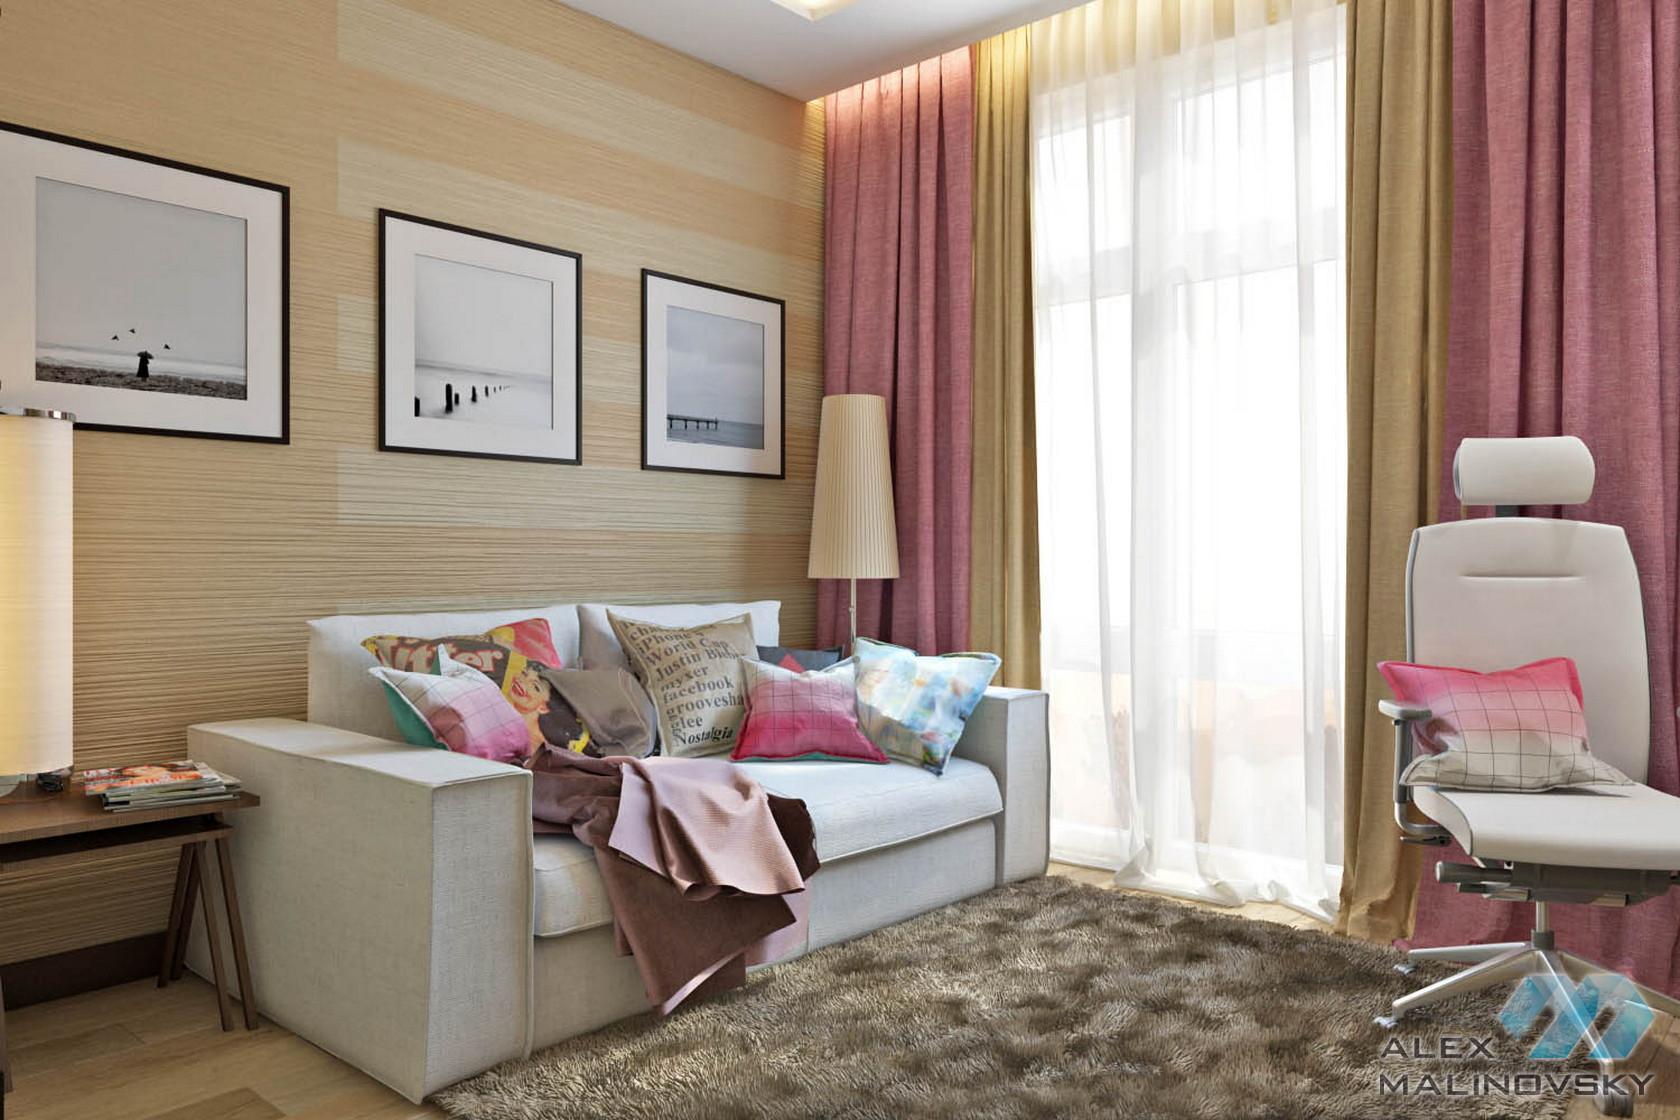 Гостевая, 4х комнатная квартира в Одинцово